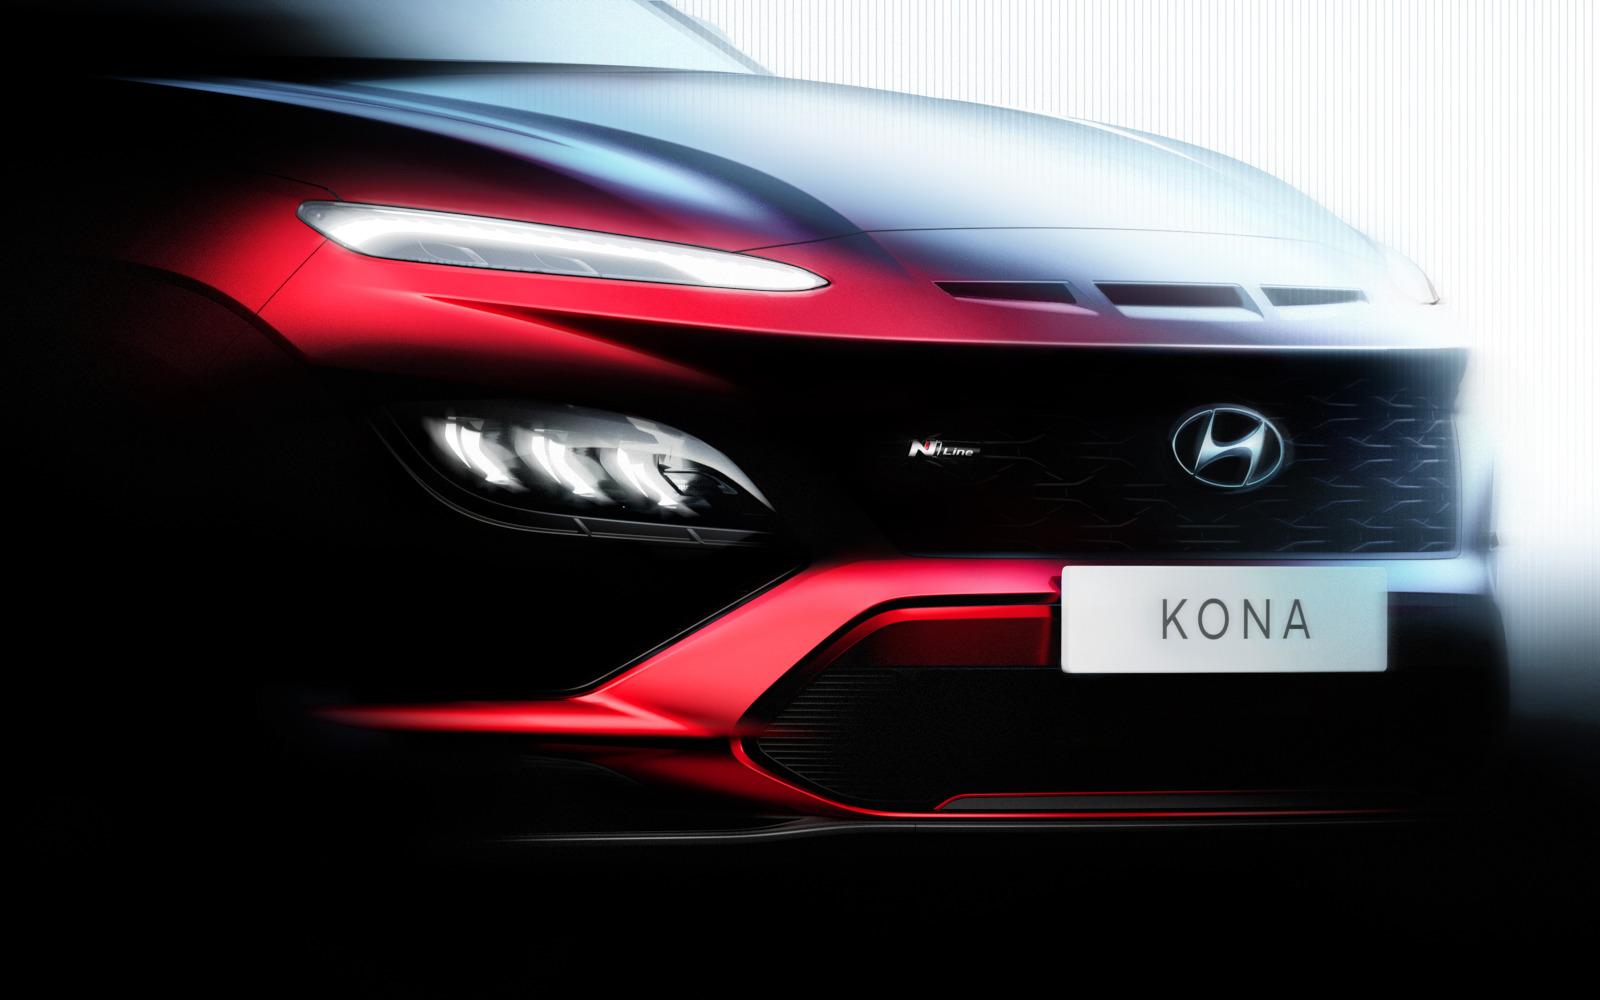 New Car Kona Image